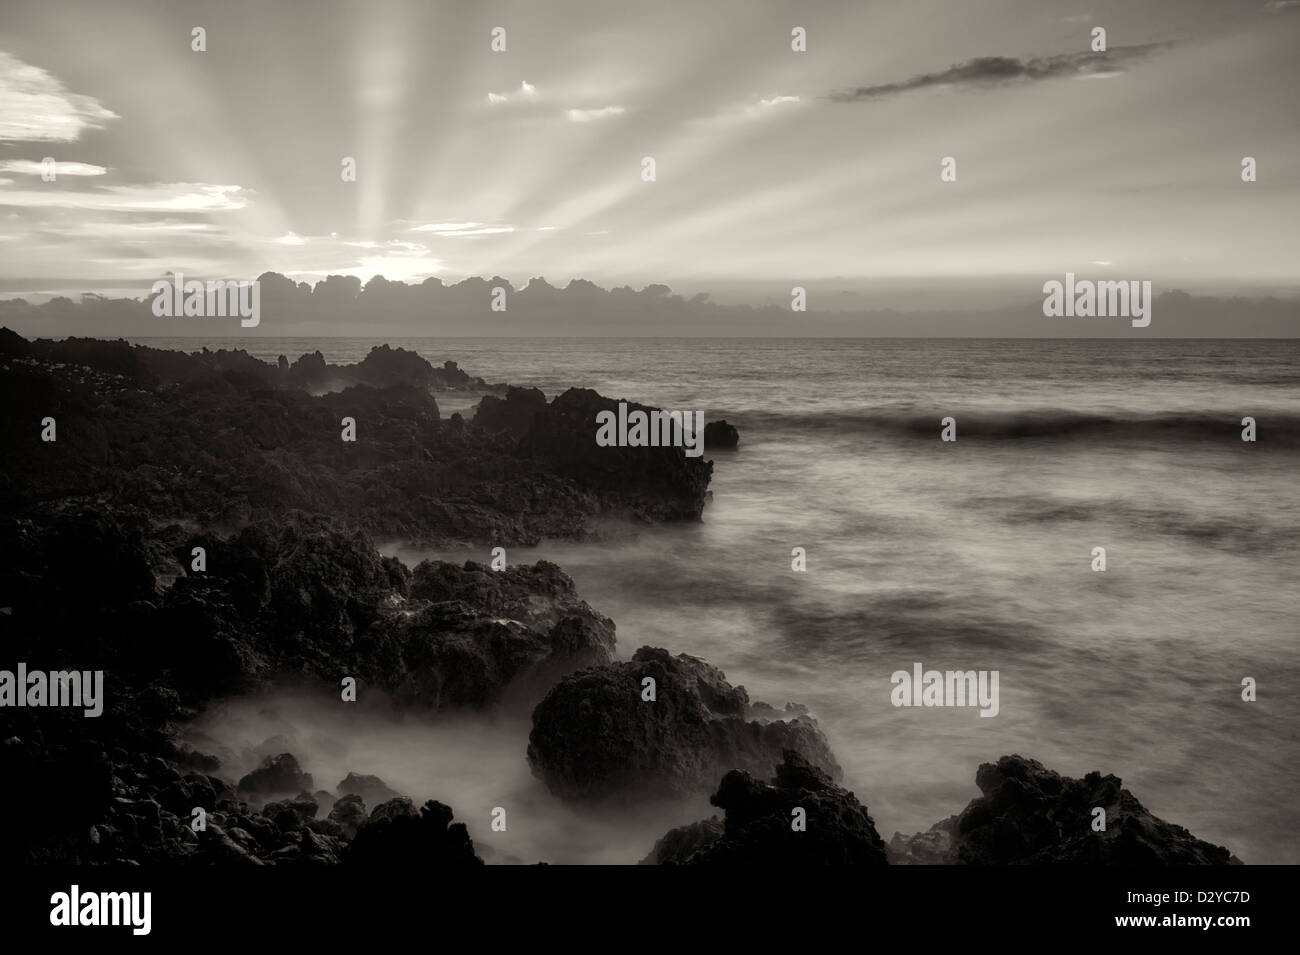 Sunset with God's rays. The Kohala Coast. The Big Island, Hawaii. - Stock Image